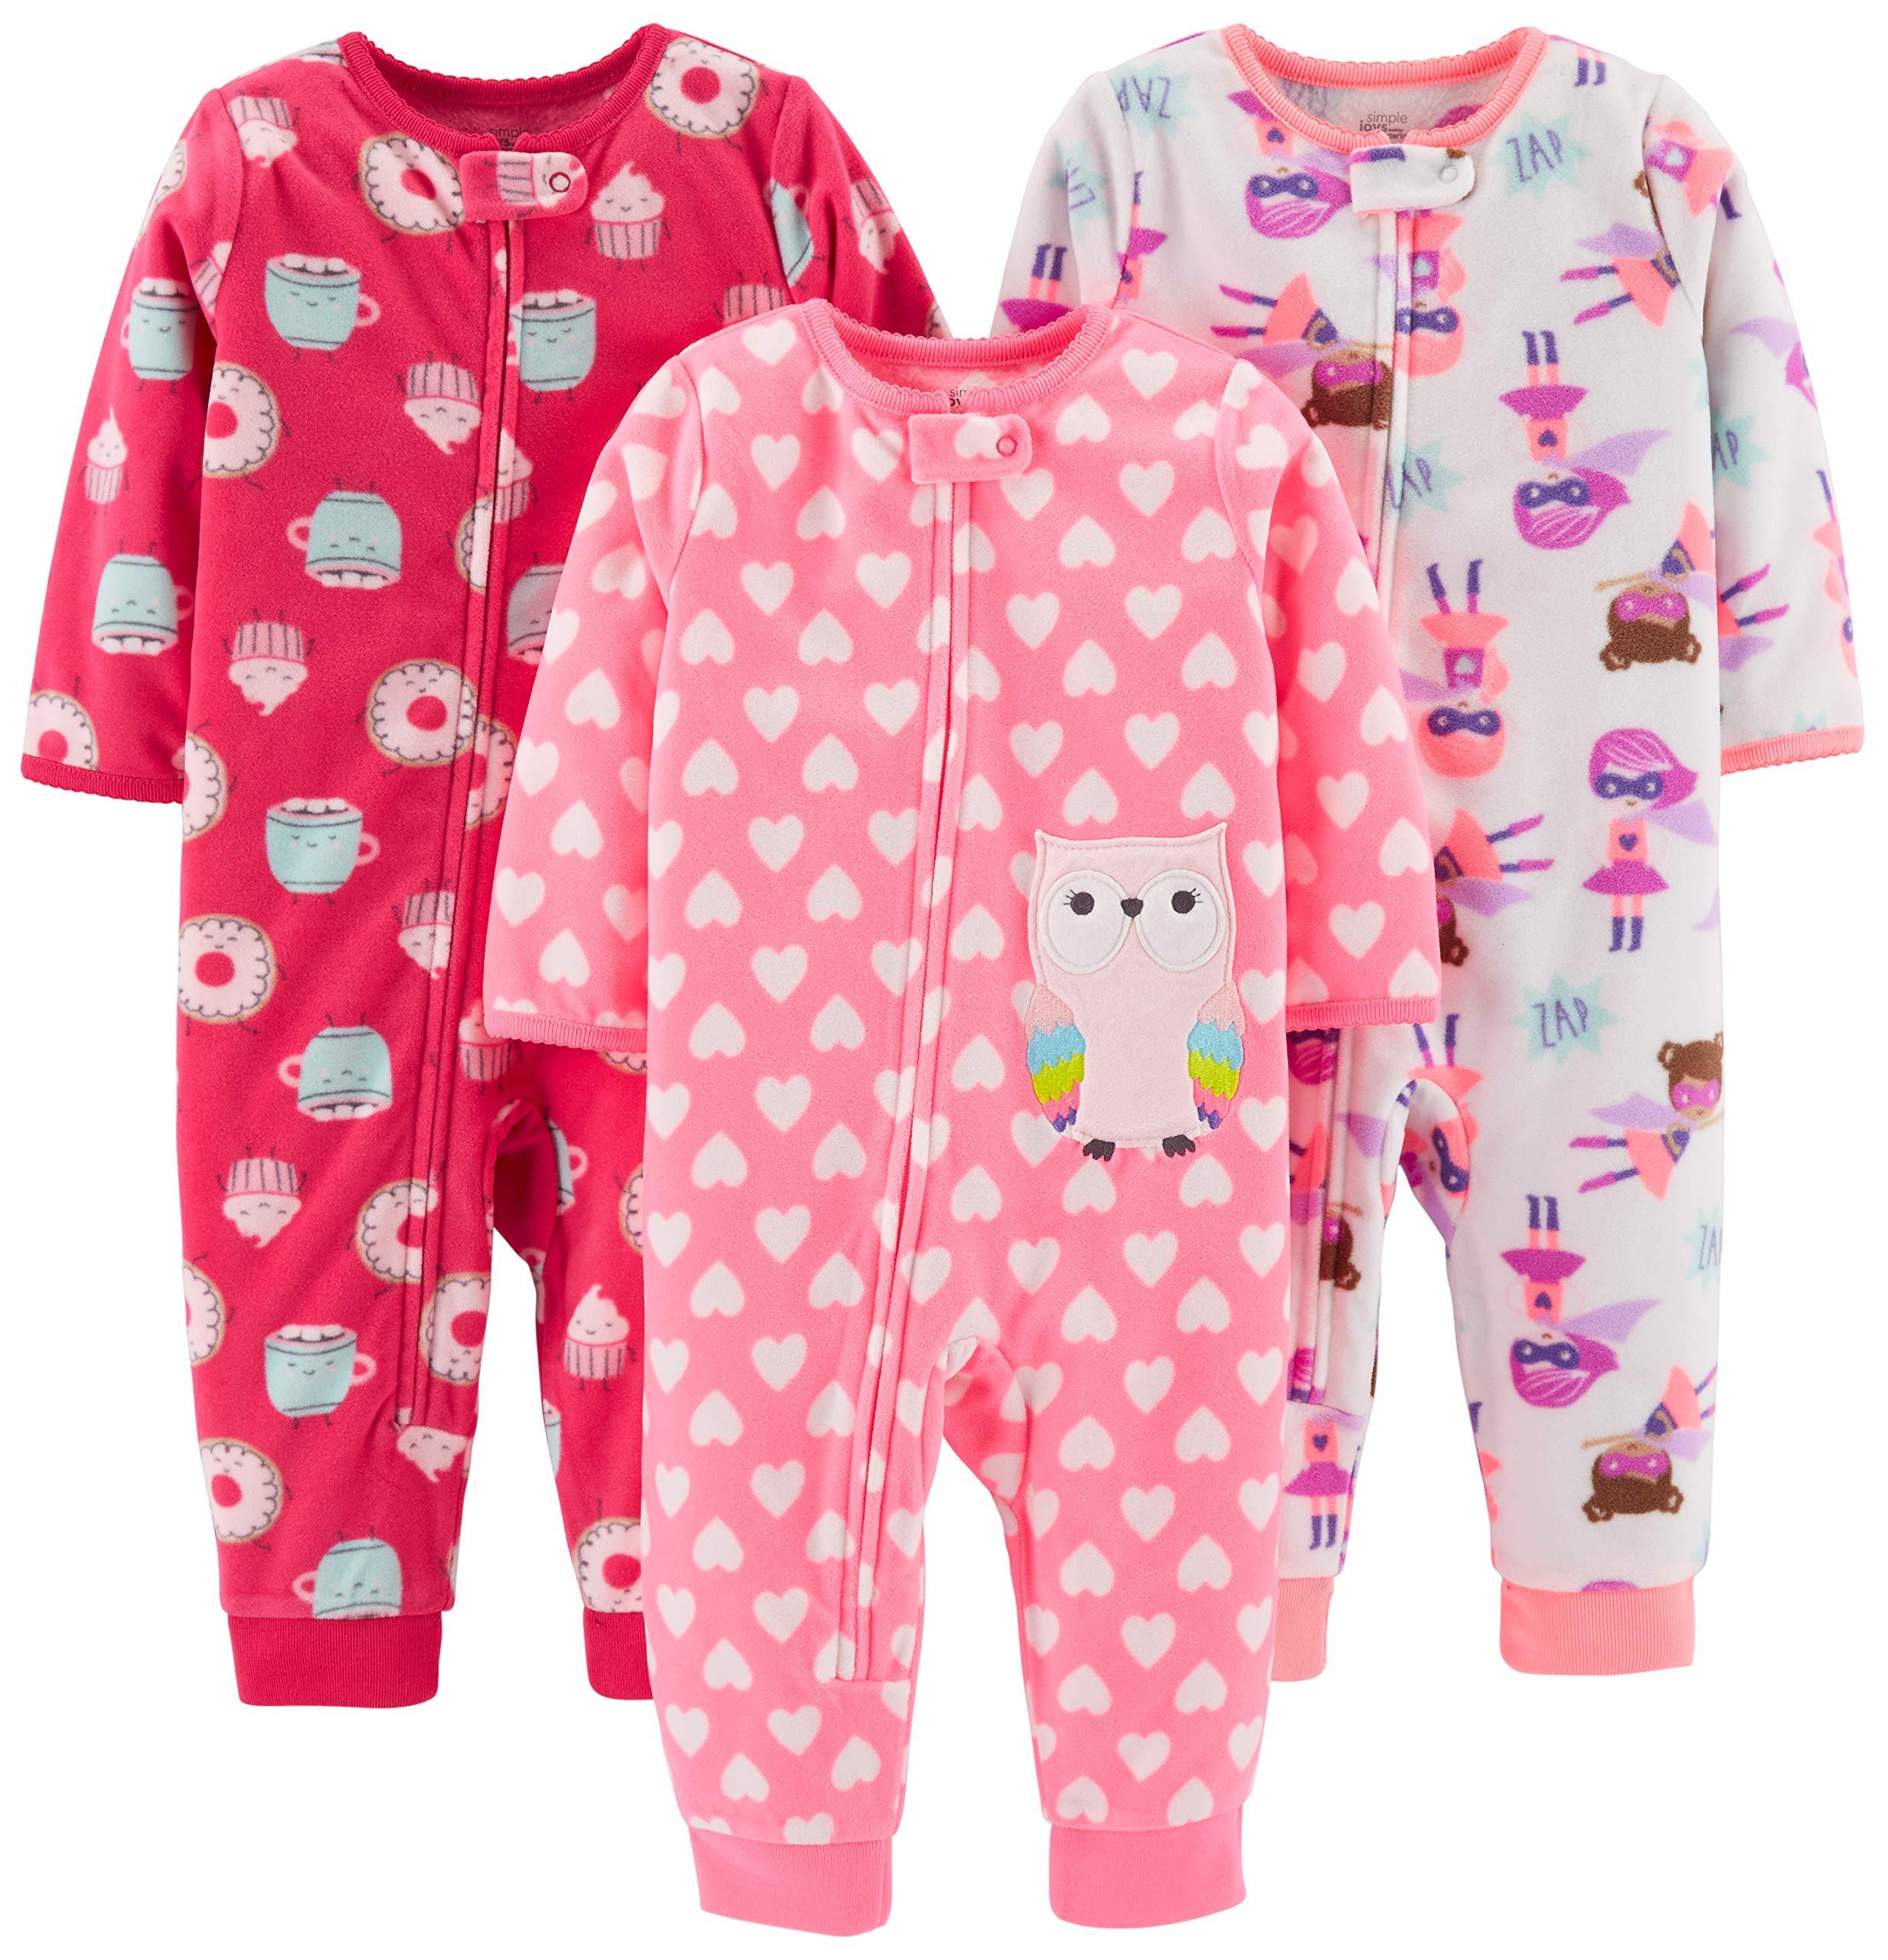 Simple Joys by Carter's Girls' 3-Pack Loose Fit Flame Resistant Fleece Footless Pajamas, Superhero/Donut/owl, 18 Months by Simple Joys by Carter's